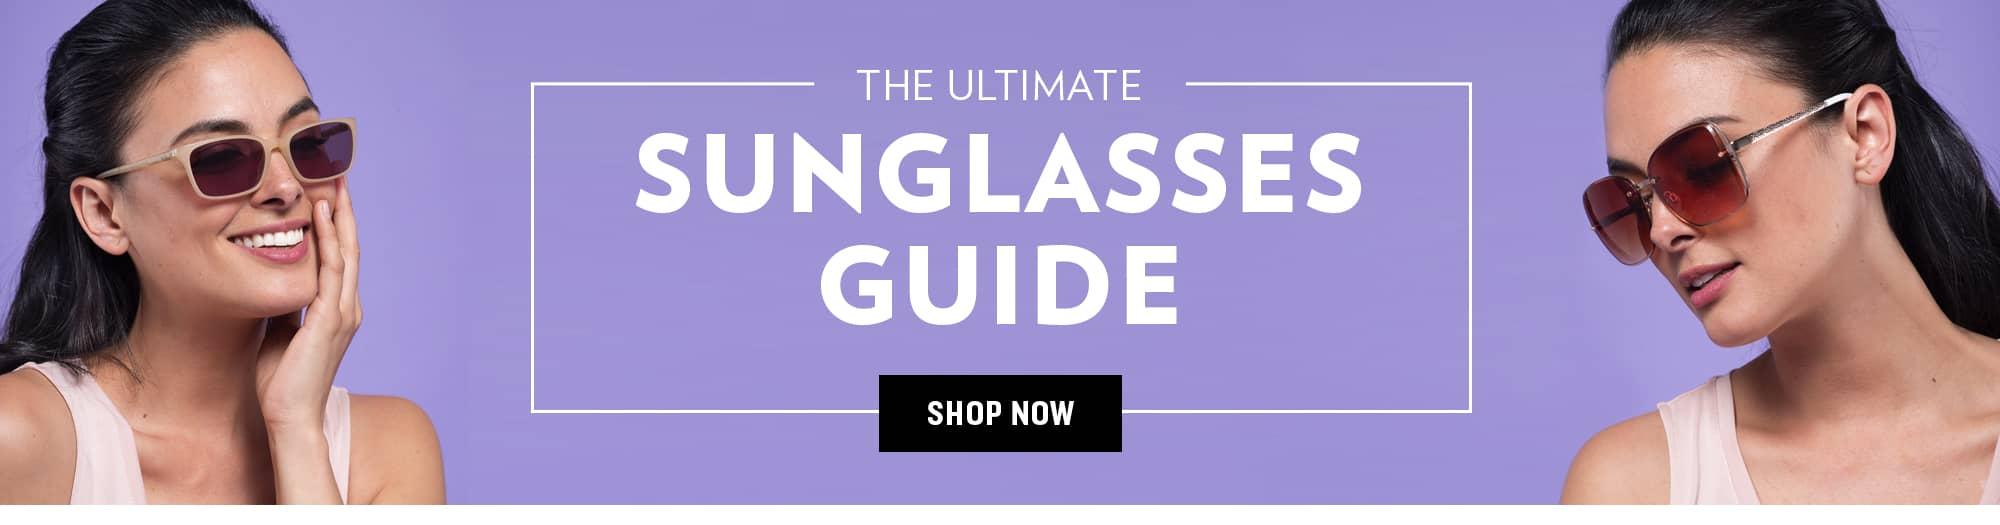 Shop Sunglasses Guide